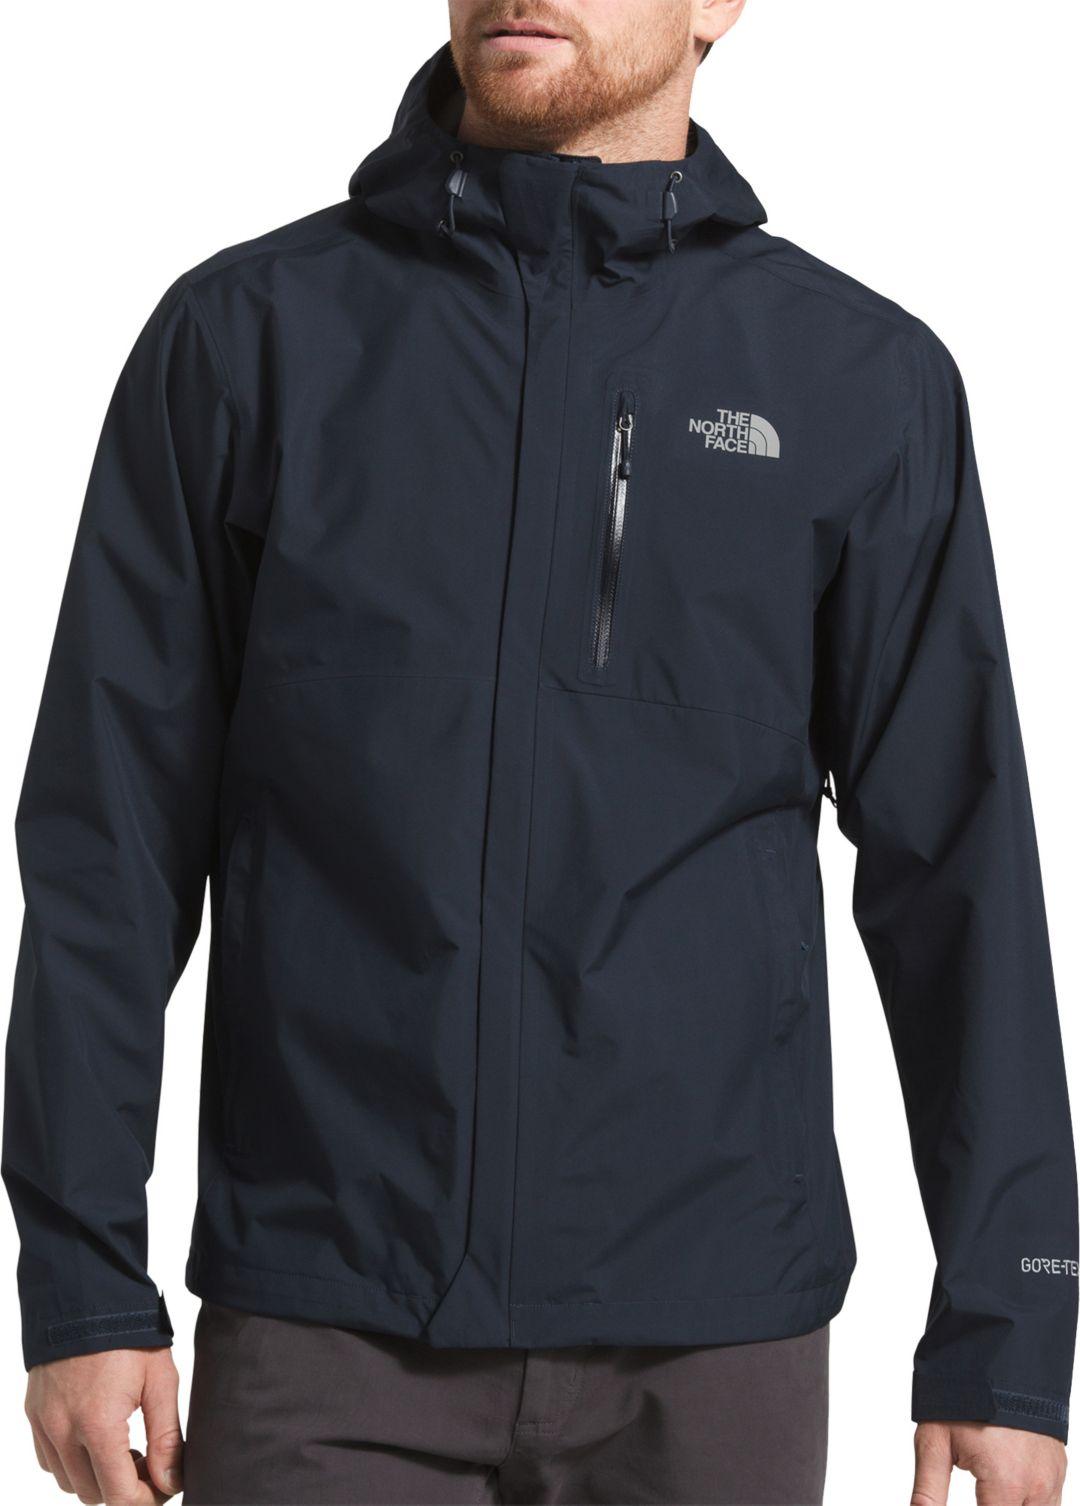 3599eb398 The North Face Men's Dryzzle Jacket